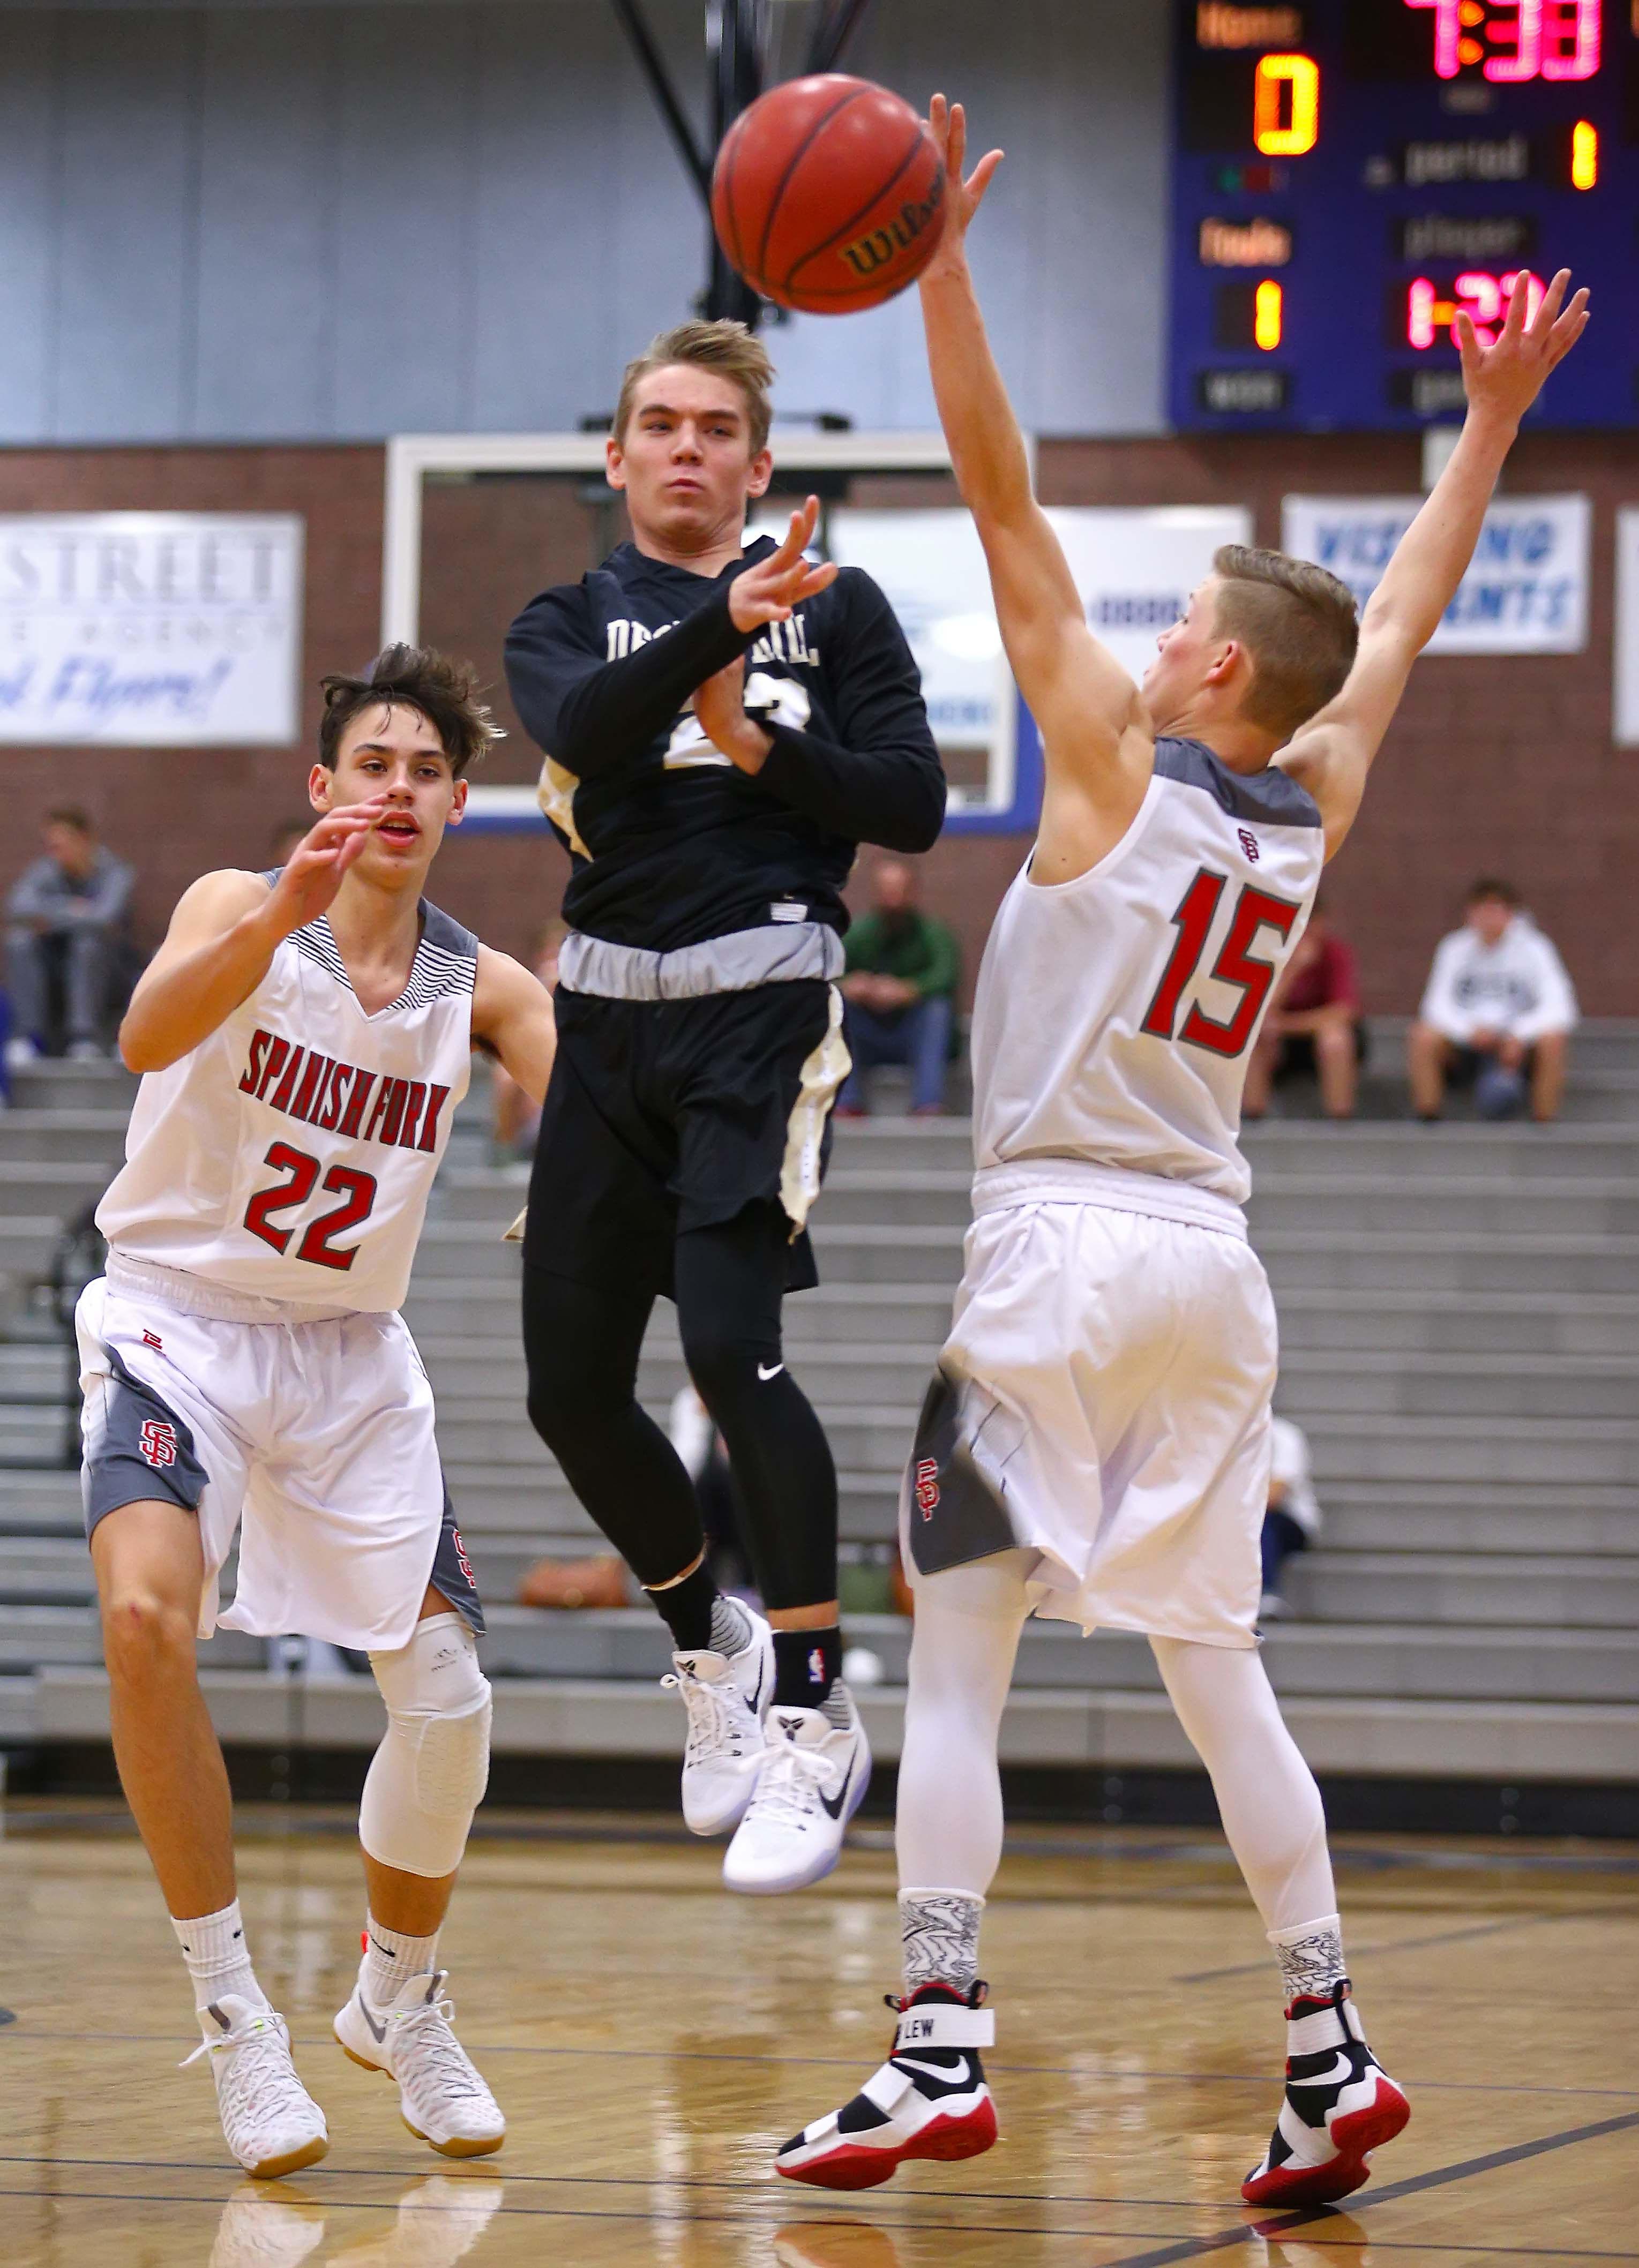 Desert Hills' Logan Hokanson (23), Desert Hills vs. Spanish Fork, Boys Basketball, St. George, Utah, Dec. 10, 2016, | Photo by Robert Hoppie, ASPpix.com, St. George News